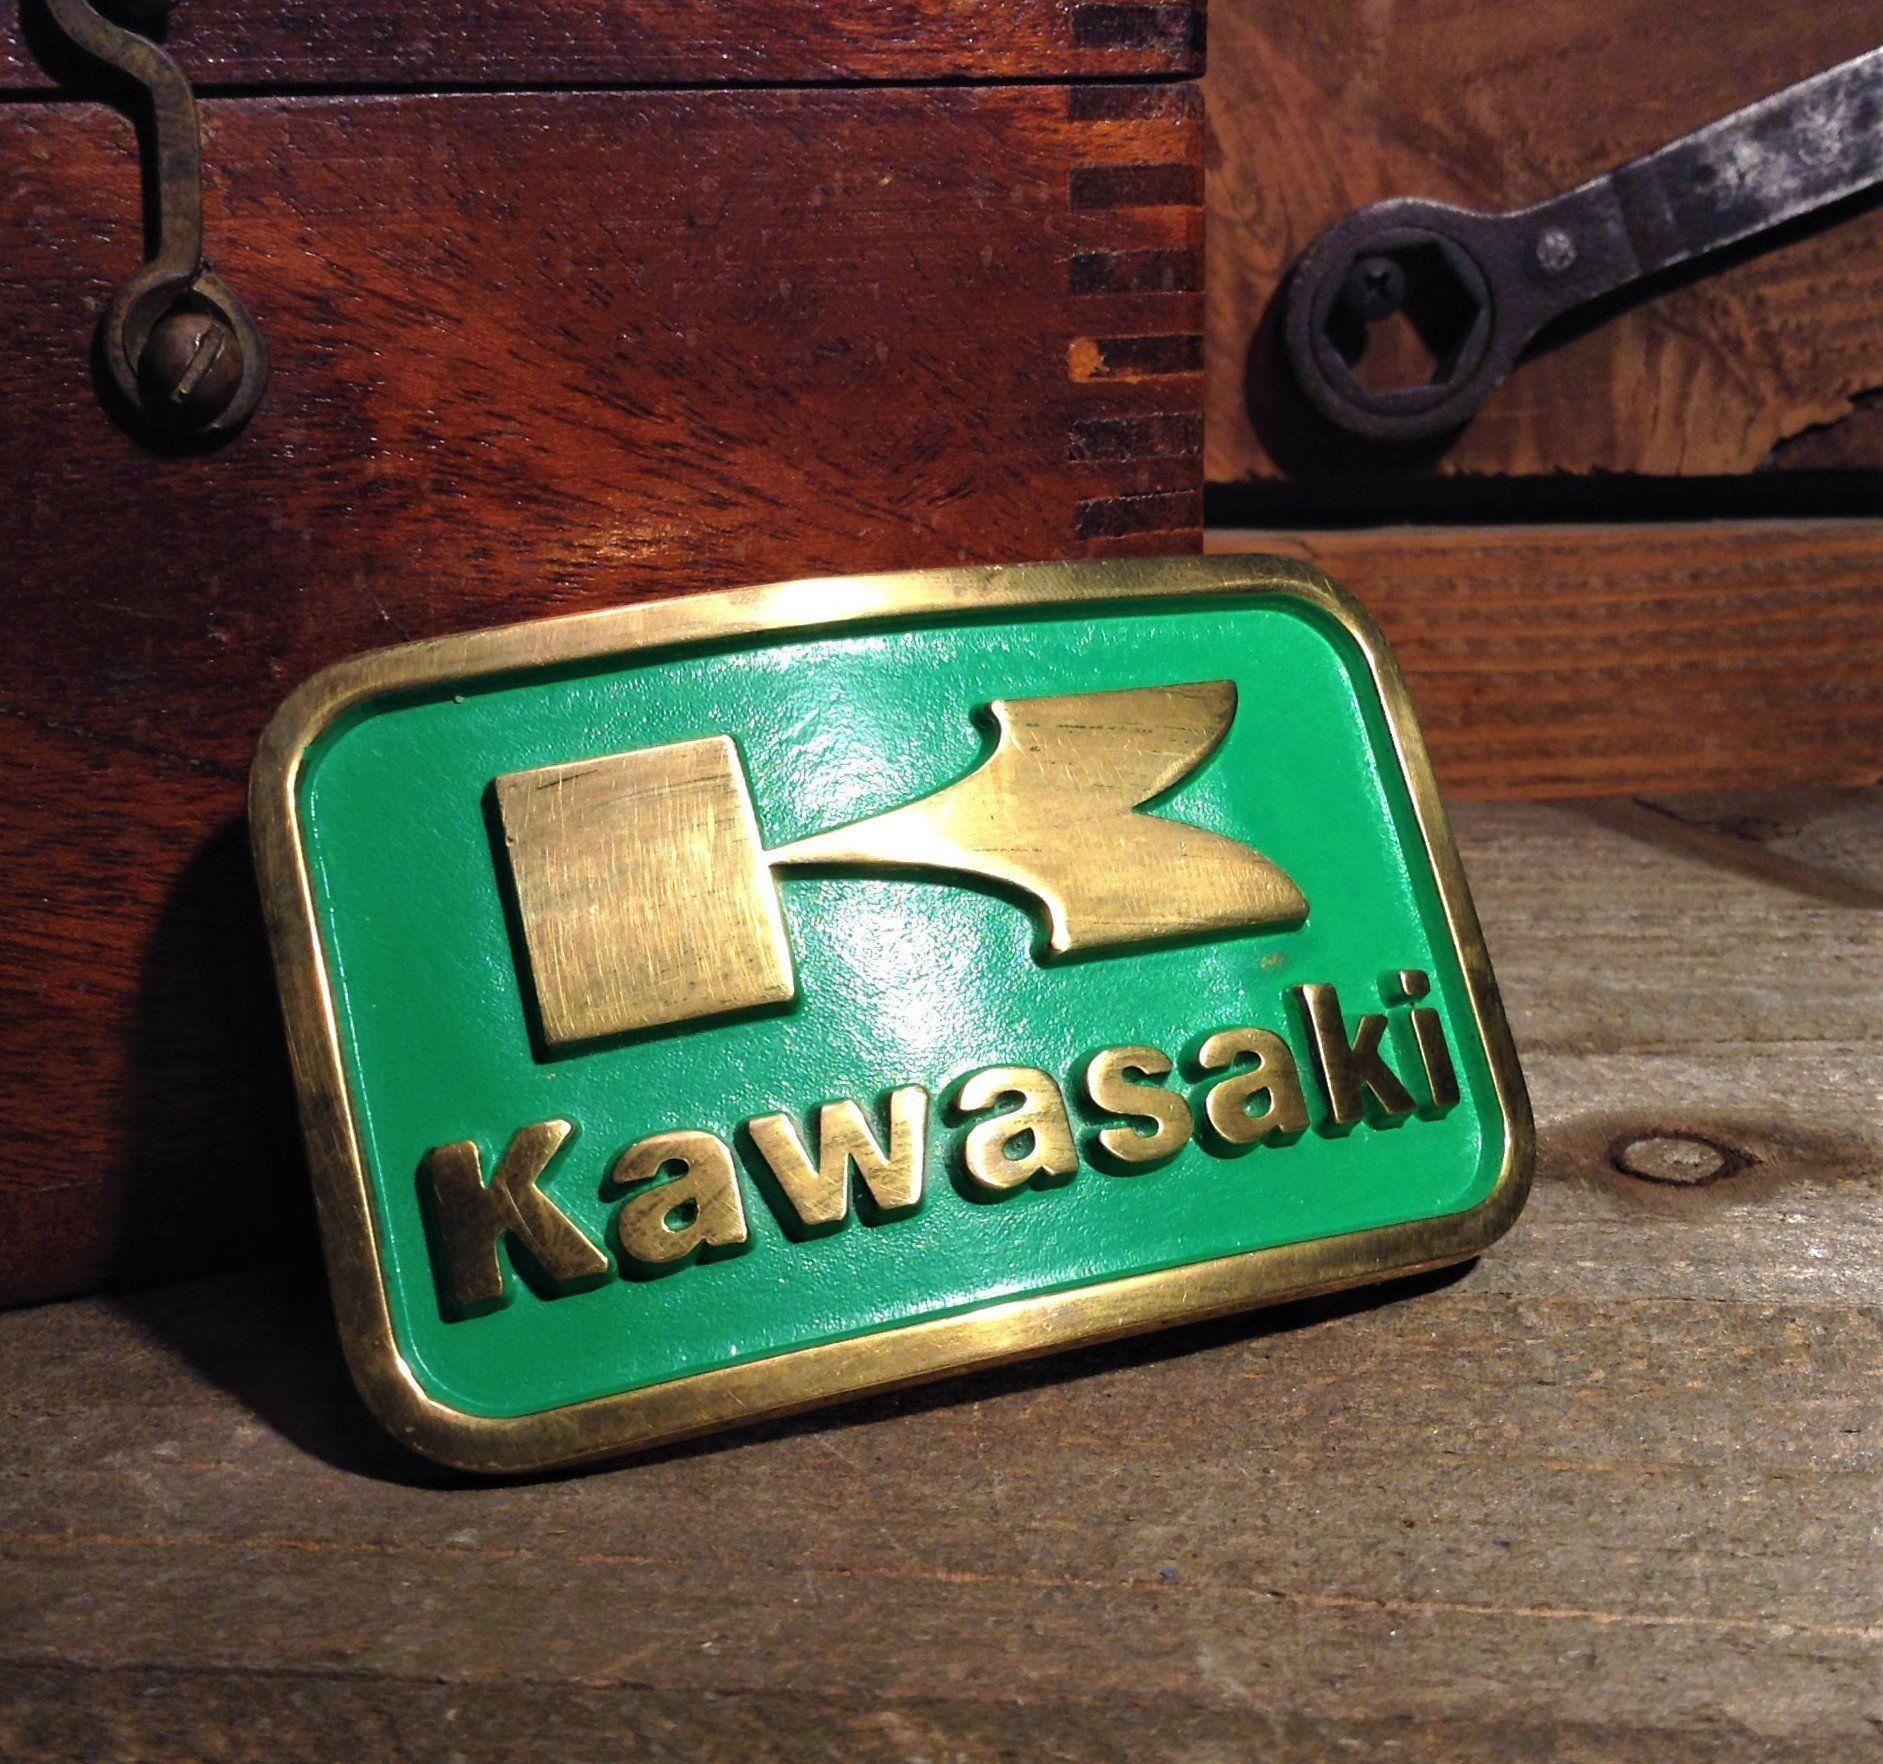 Vintage Kawasaki Belt Buckle Rare Green Solid Brass Buckle Kawasaki Motorcycles K Logo Collectible Belt Belt Buckles Brass Buckle Vintage Belt Buckles